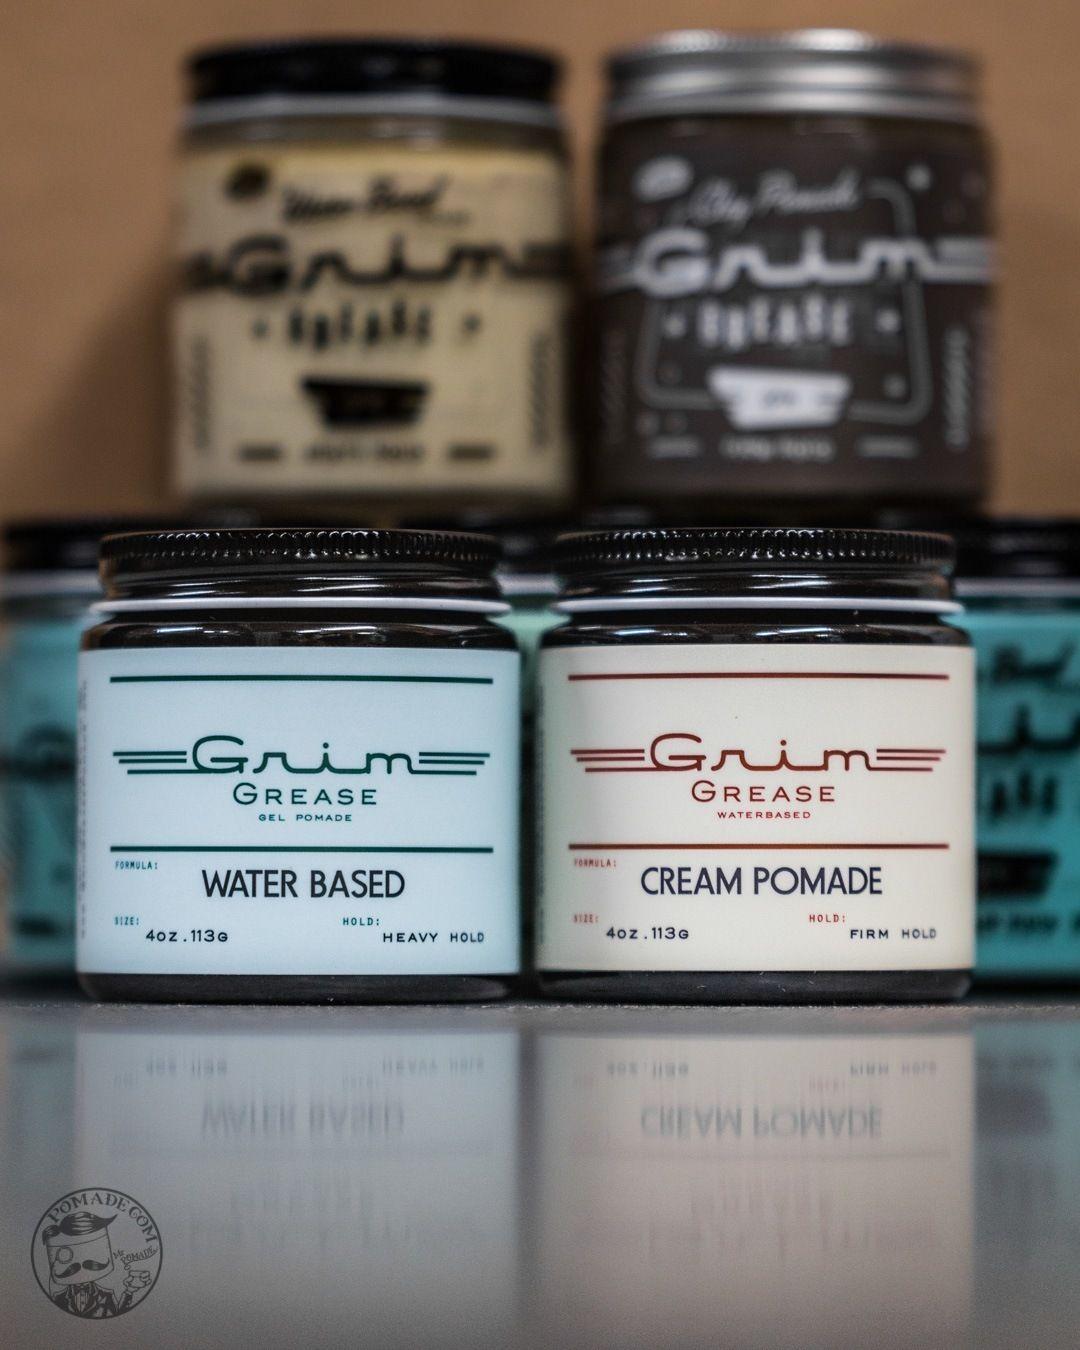 Grim Grease Cream Pomade Water Based Cream Grease Cream